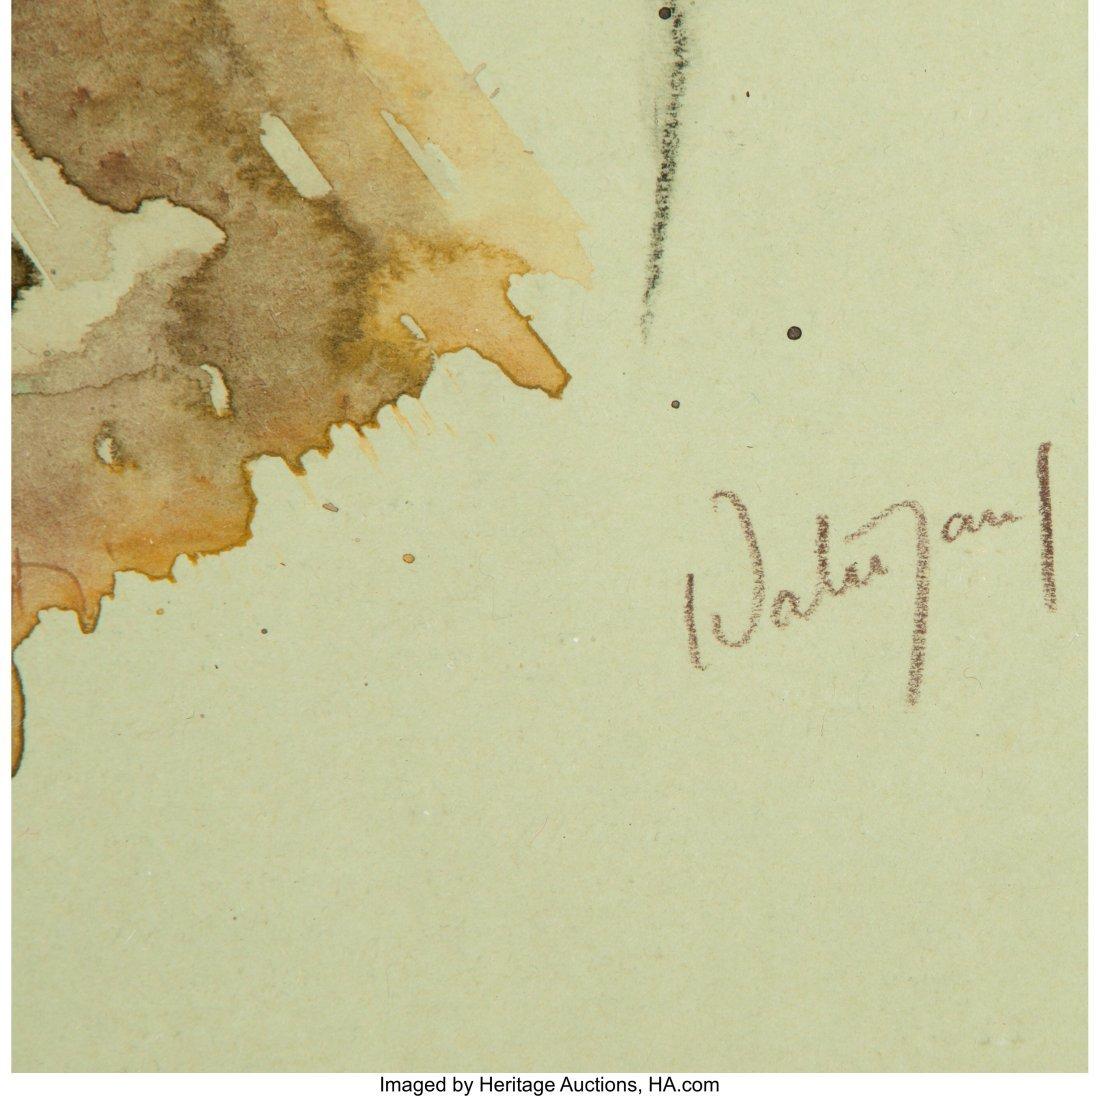 63912: Hubert de Watrigant (French, b. 1954) Blue White - 3